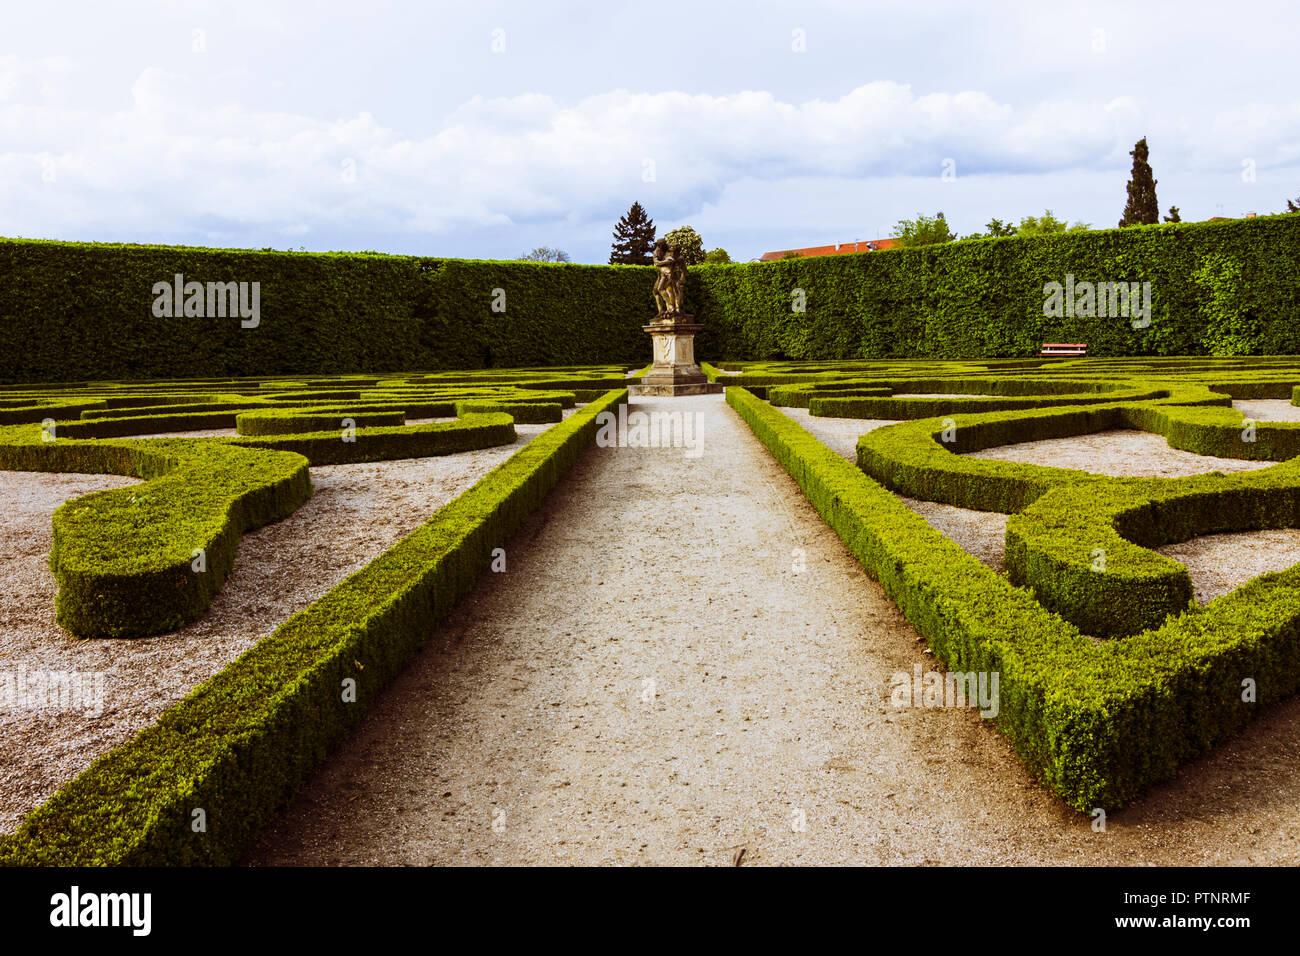 Kromeriz, Moravia, Czech Republic : Baroque flower garden of the Kromeriz castle. - Stock Image